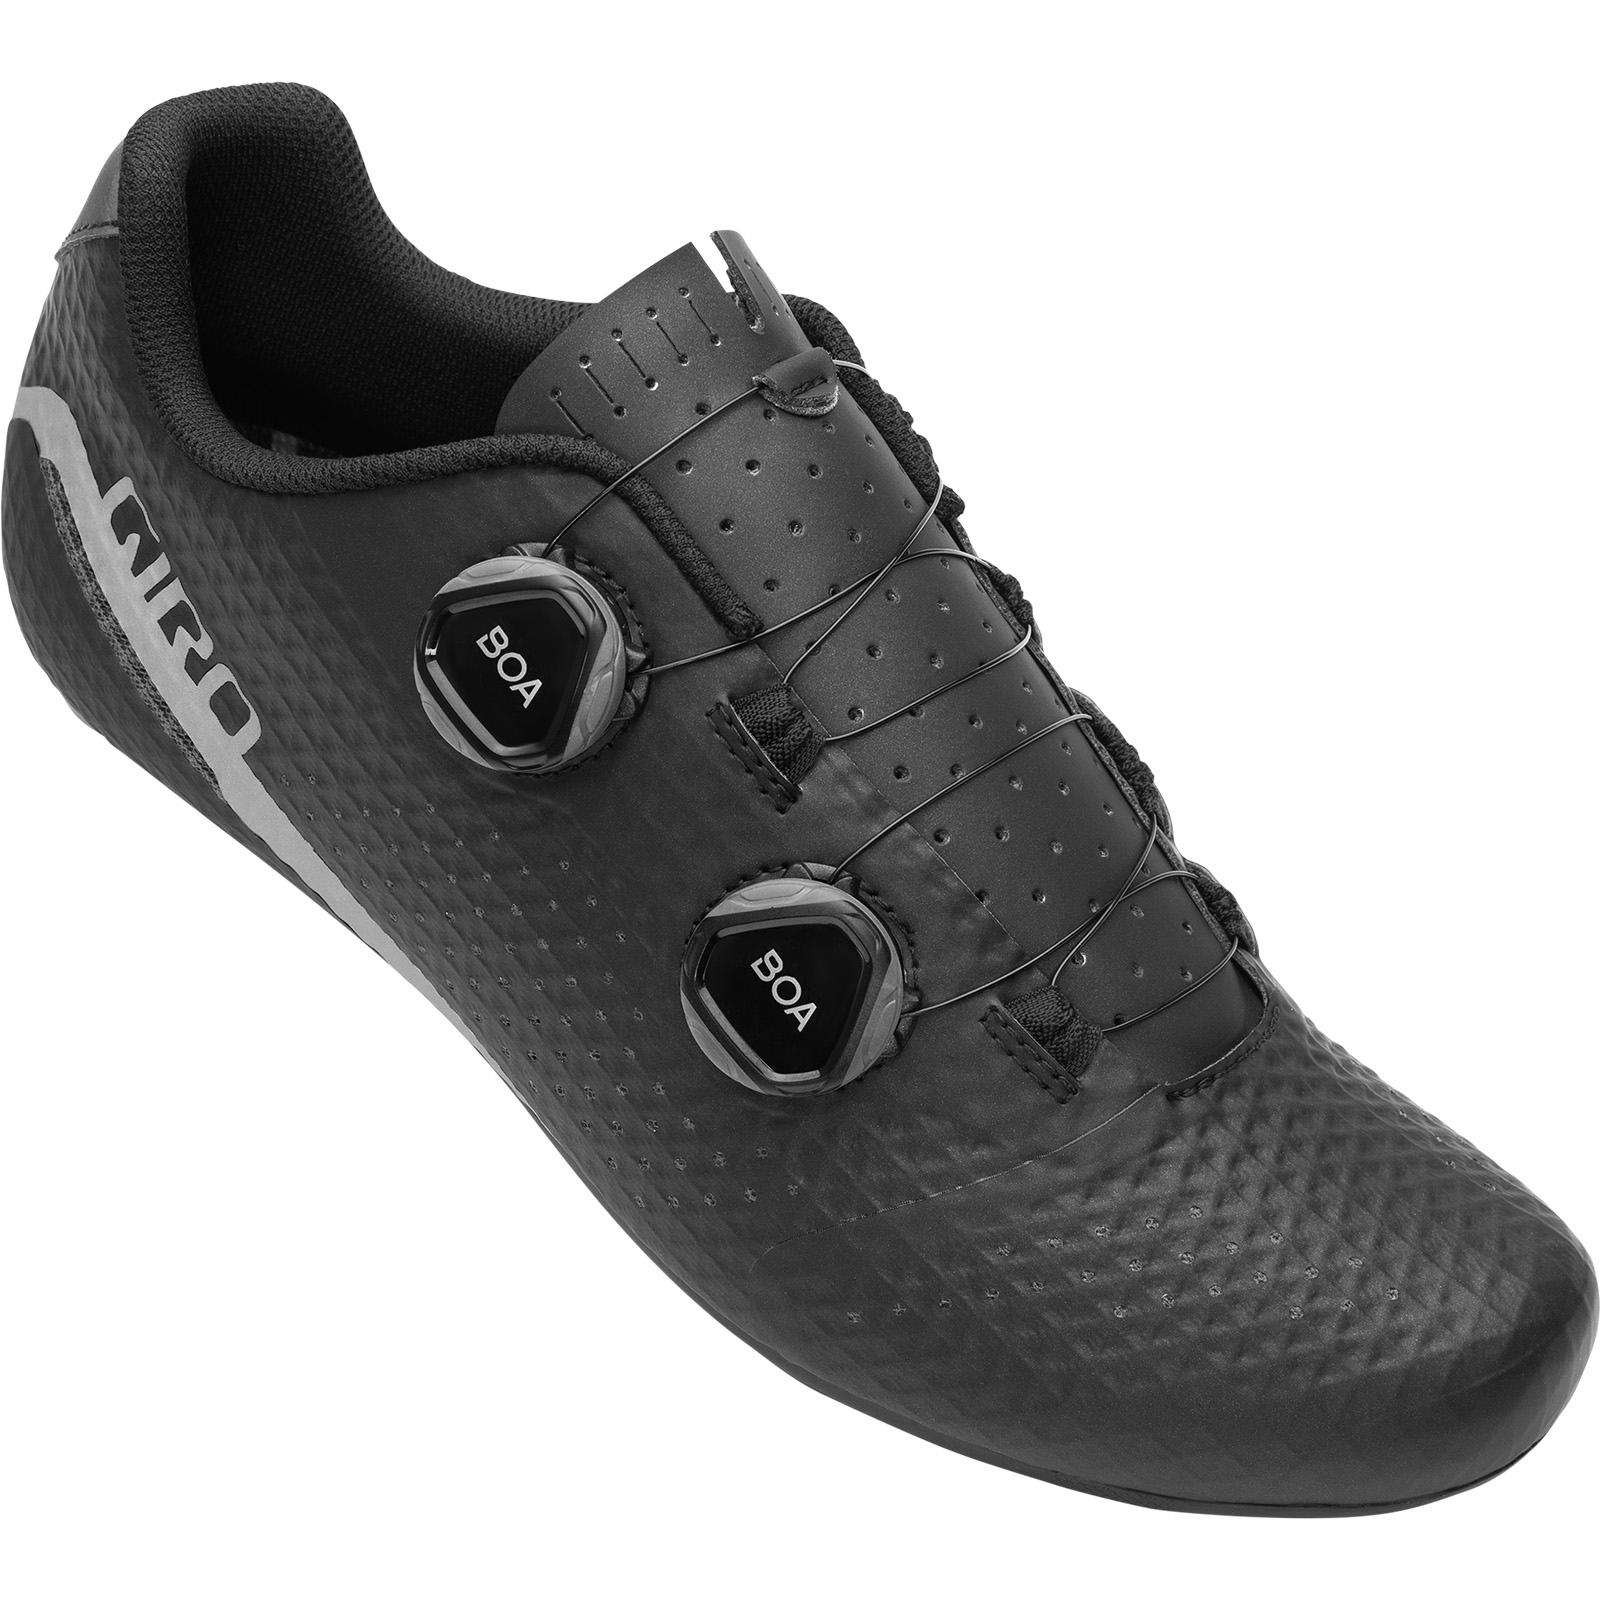 Picture of Giro Regime Road Shoe - black